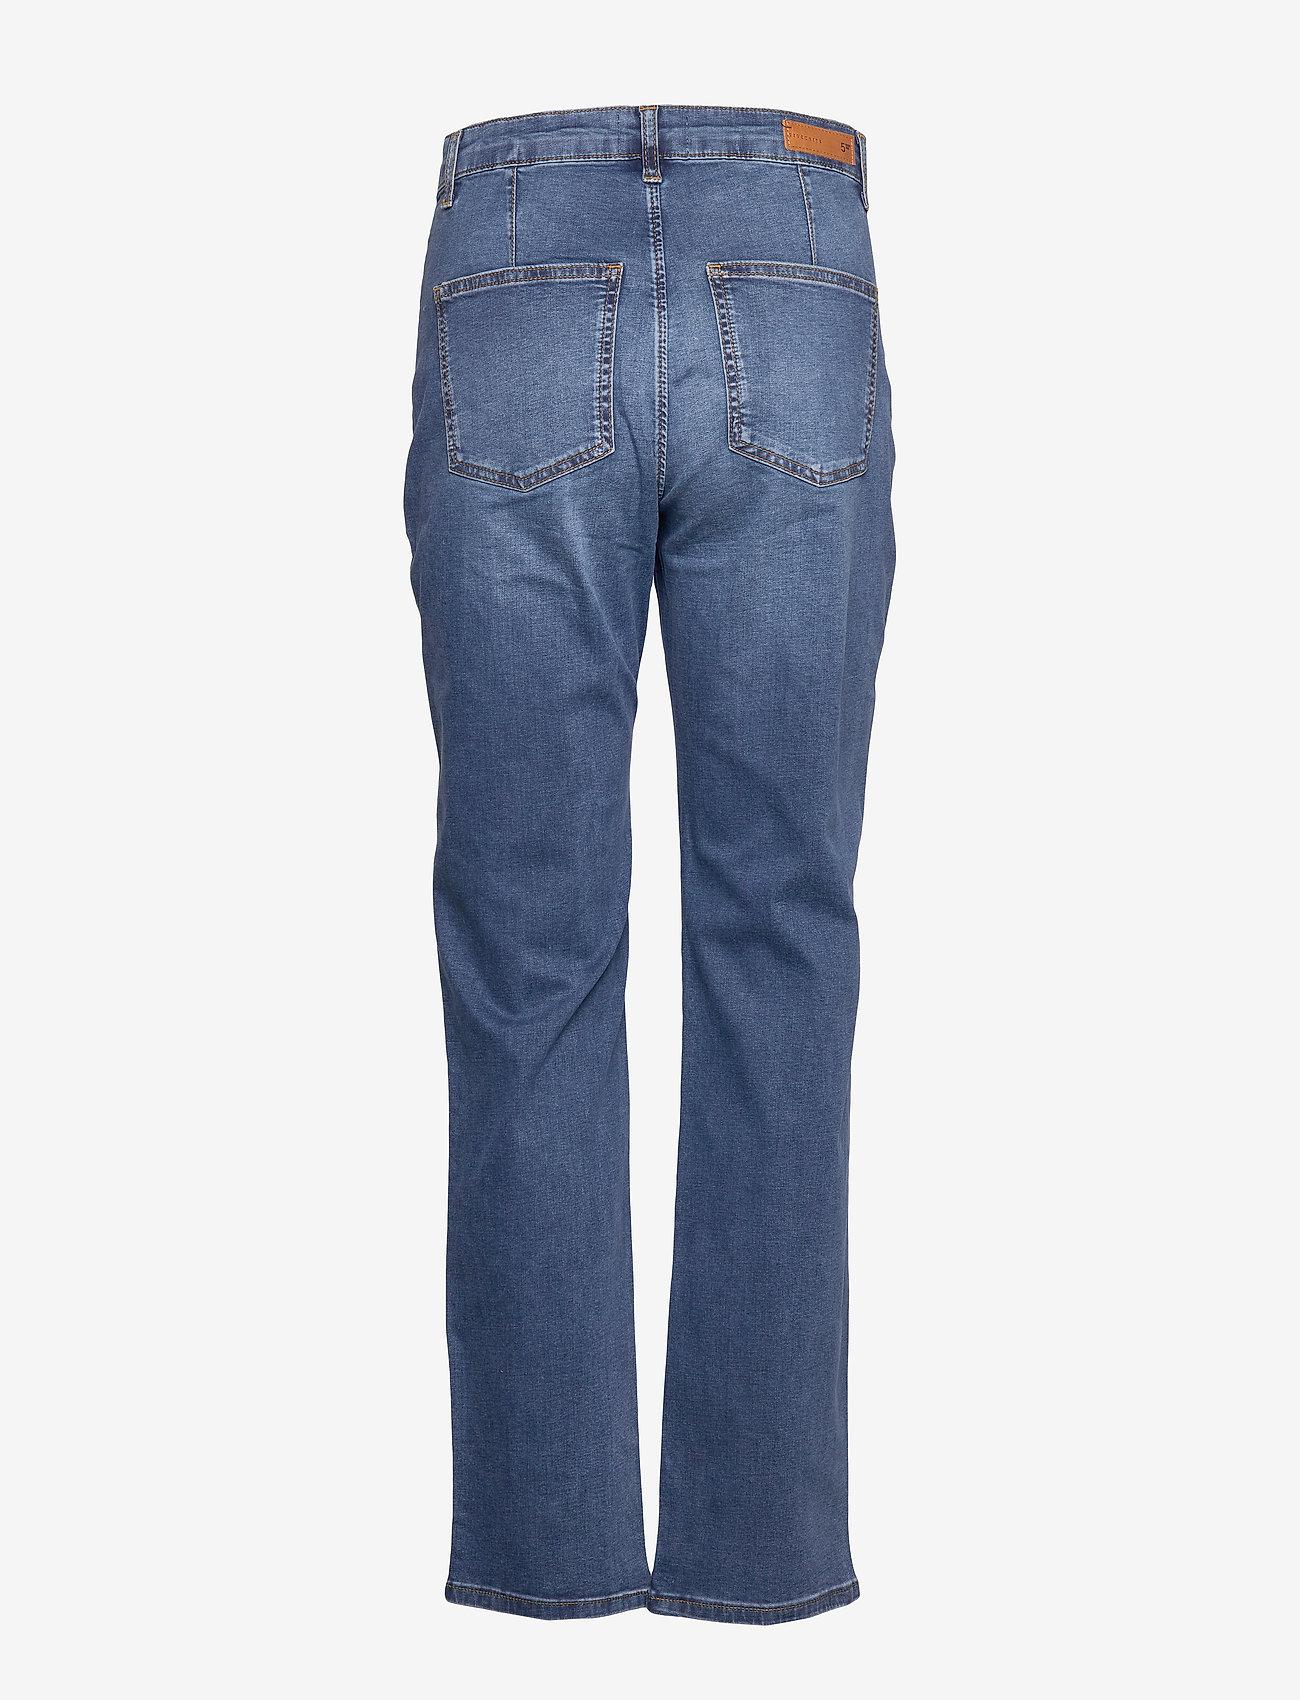 FIVEUNITS - Jolie 621 Straight - straight jeans - aviator mercy raini - 1